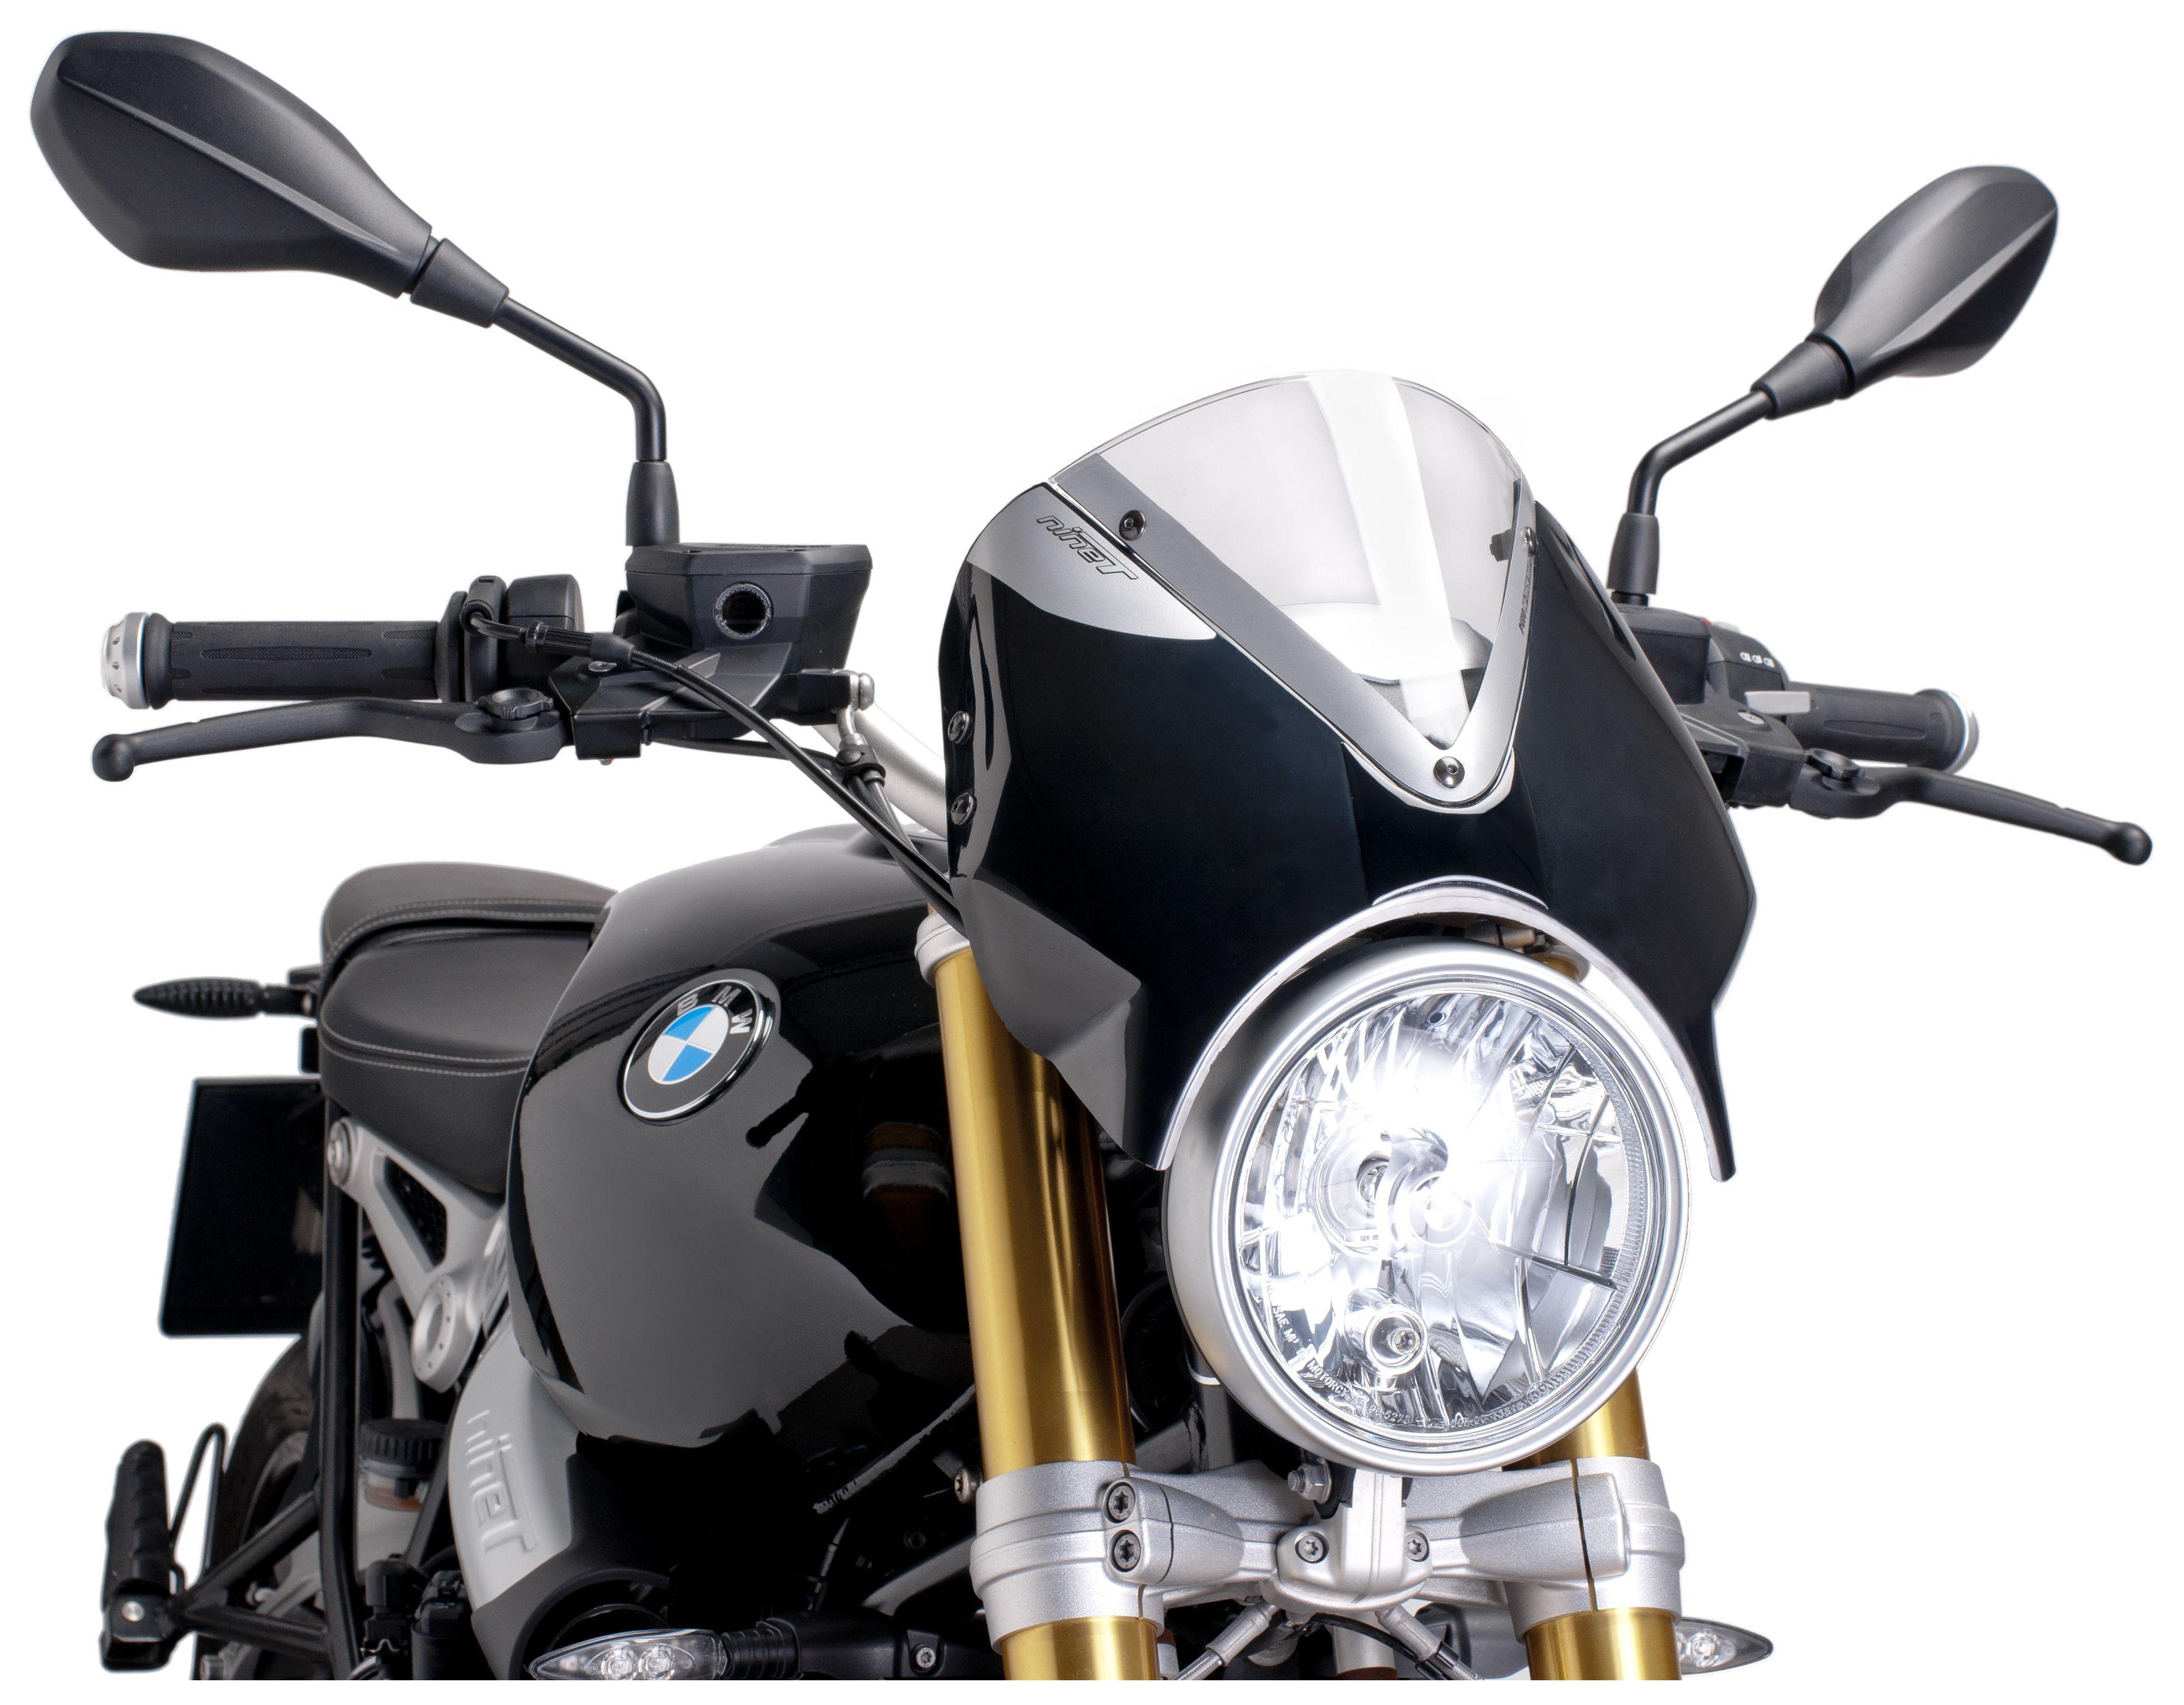 puig naked new generation windscreen bmw r nine t 2014-2017 - revzilla